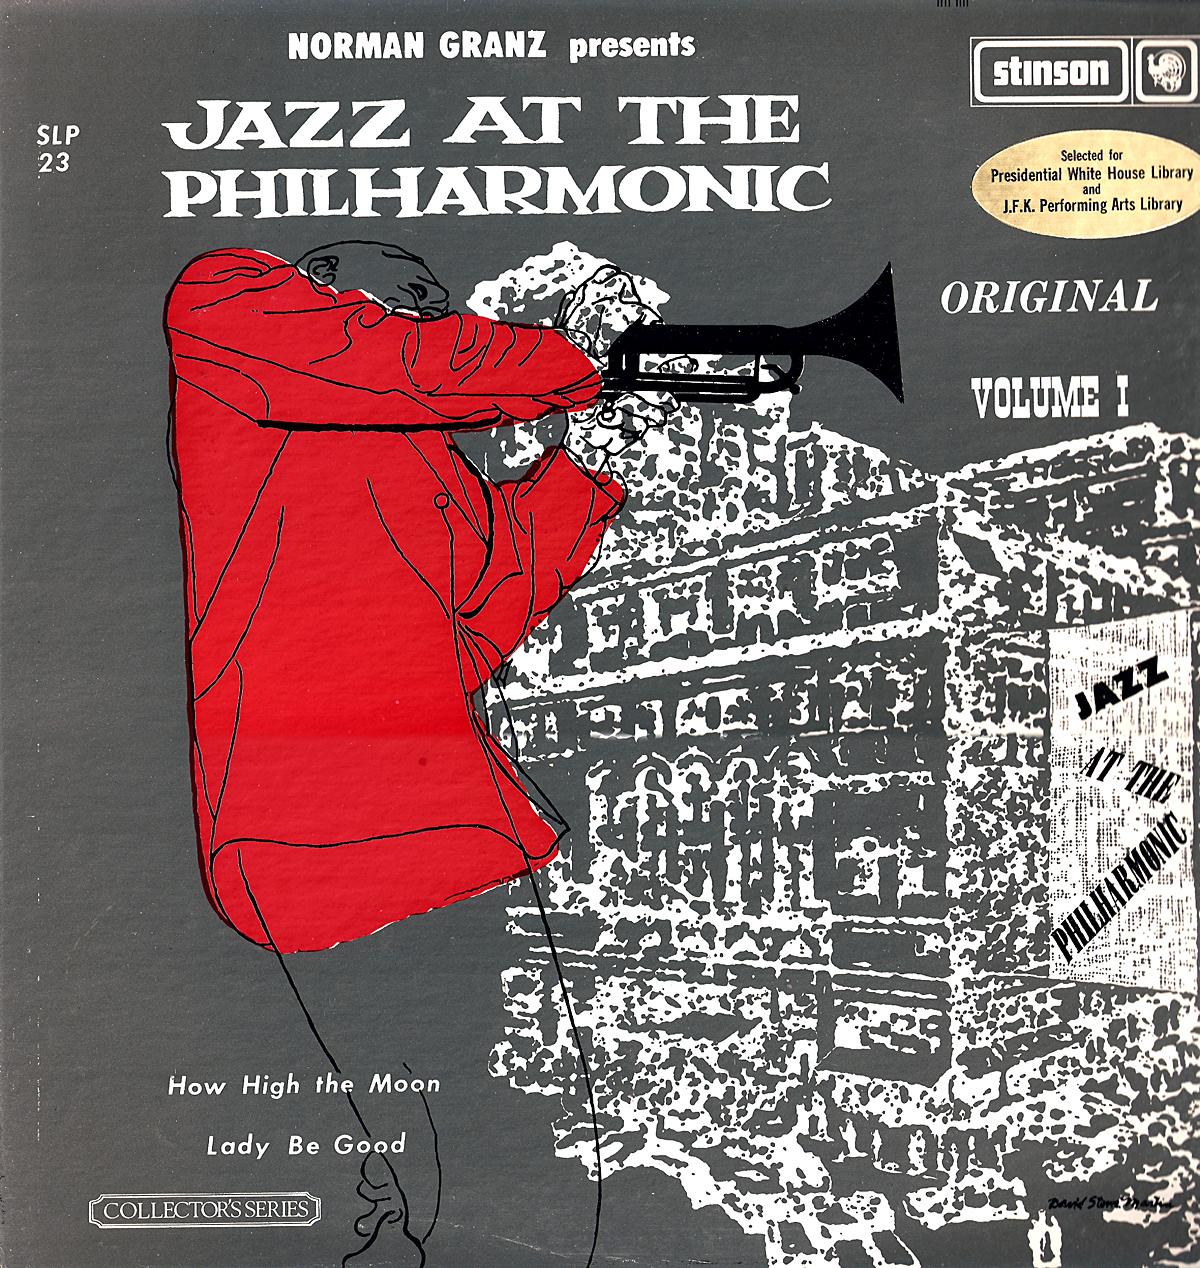 Norman Granz presents Jazz At The Philharmonic Jazz At The Philharmonic In Europe